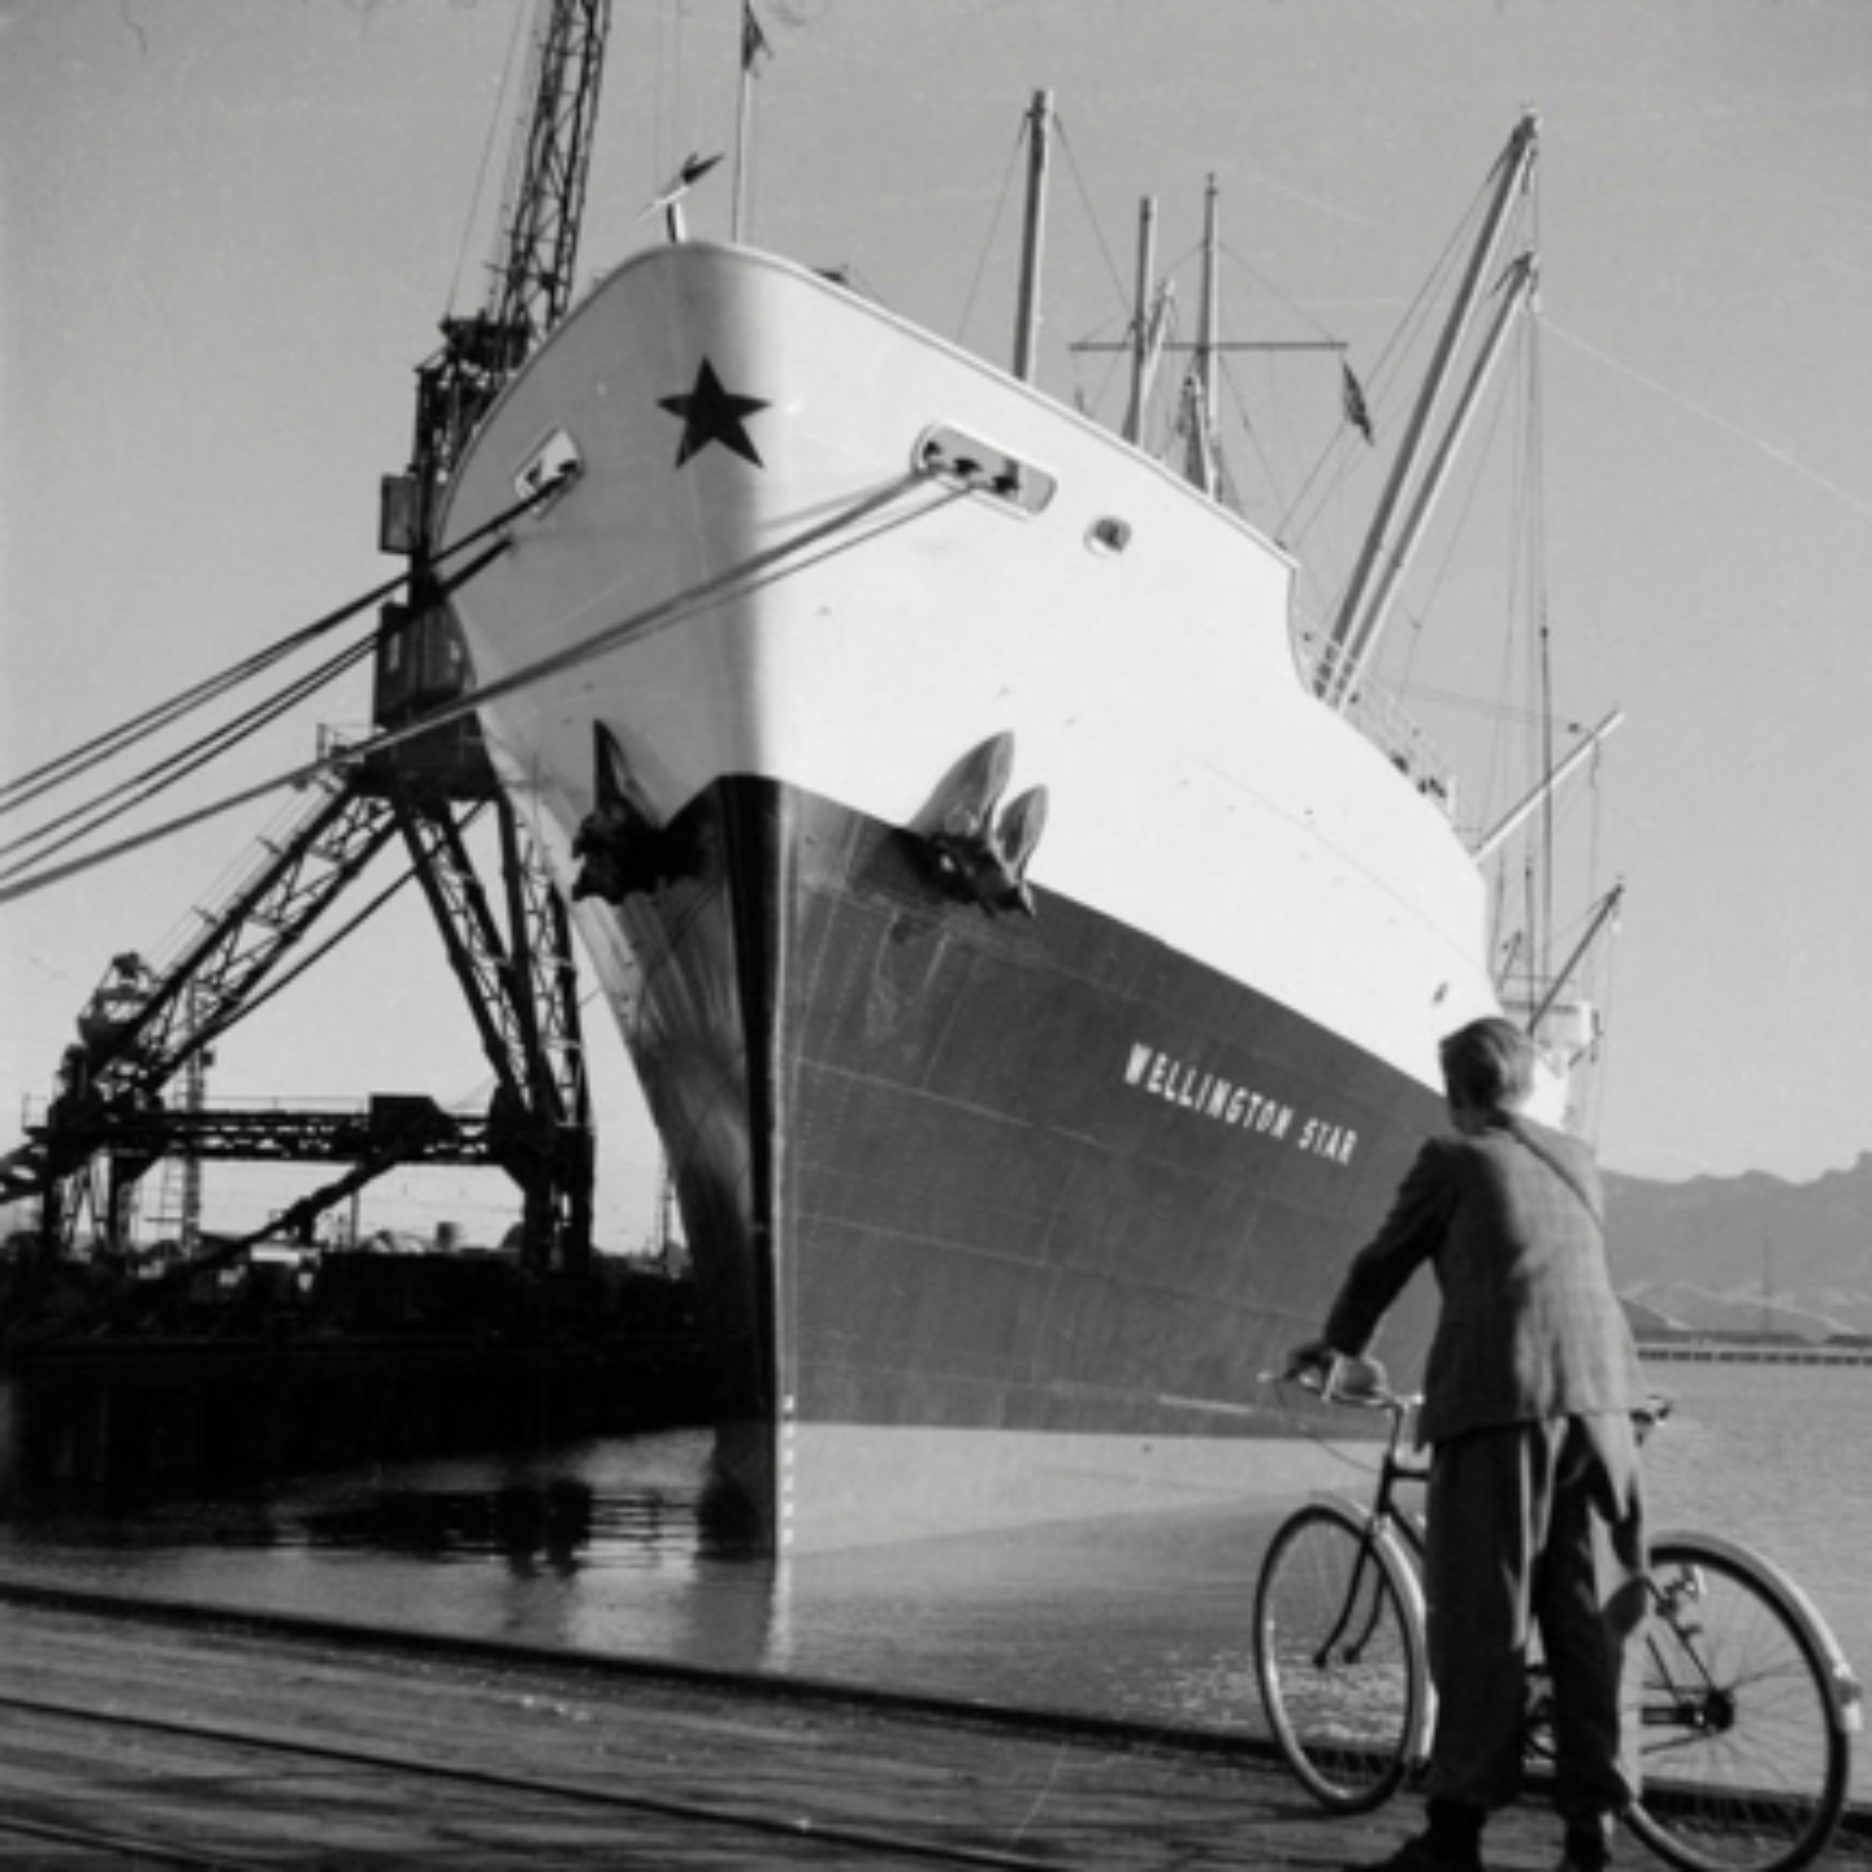 The 'Wellington Star' in Lyttelton Port, 1953 - 13214.1